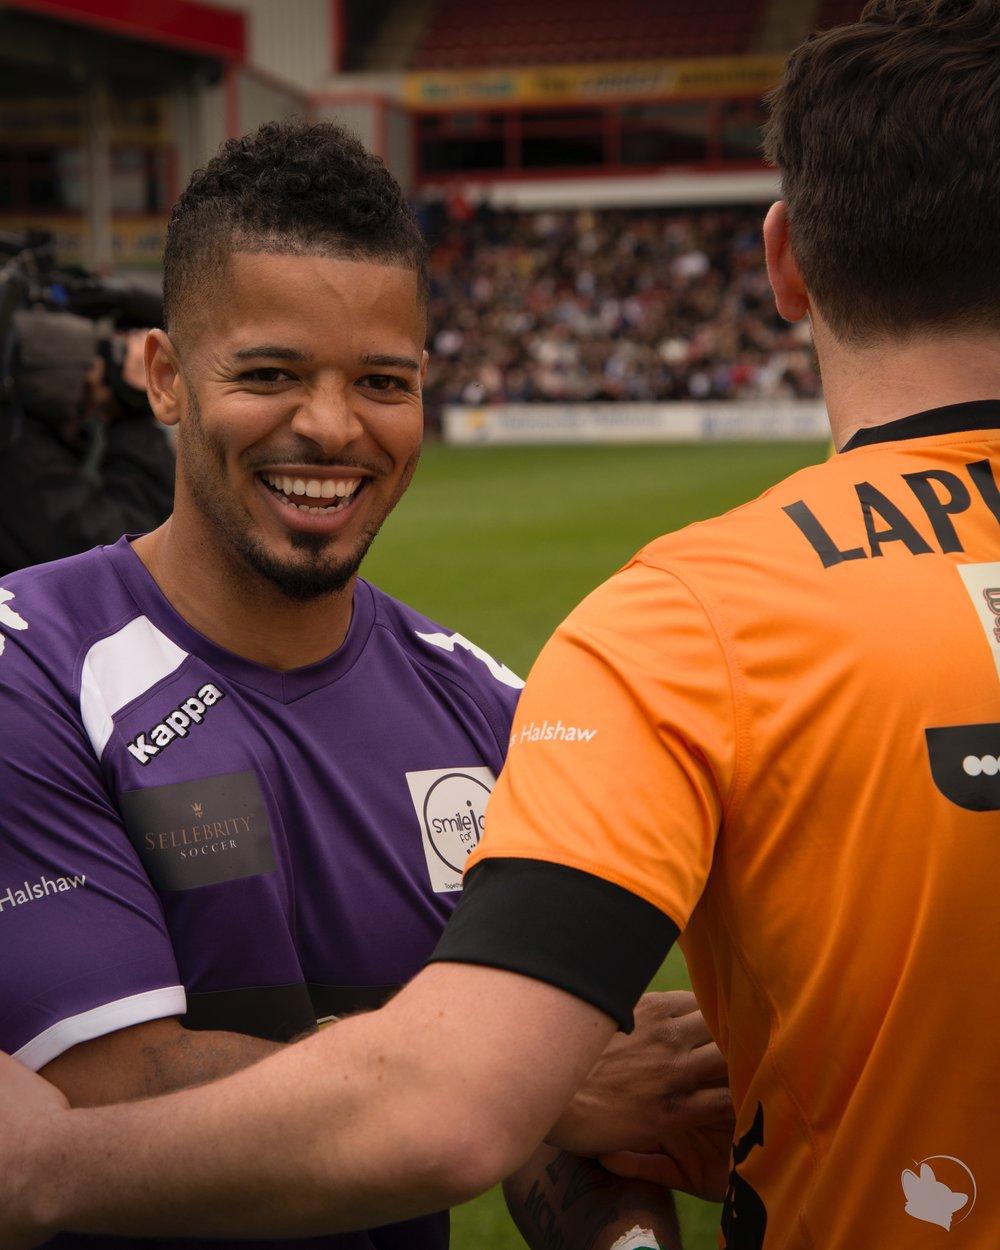 SmileForJoel Football Match